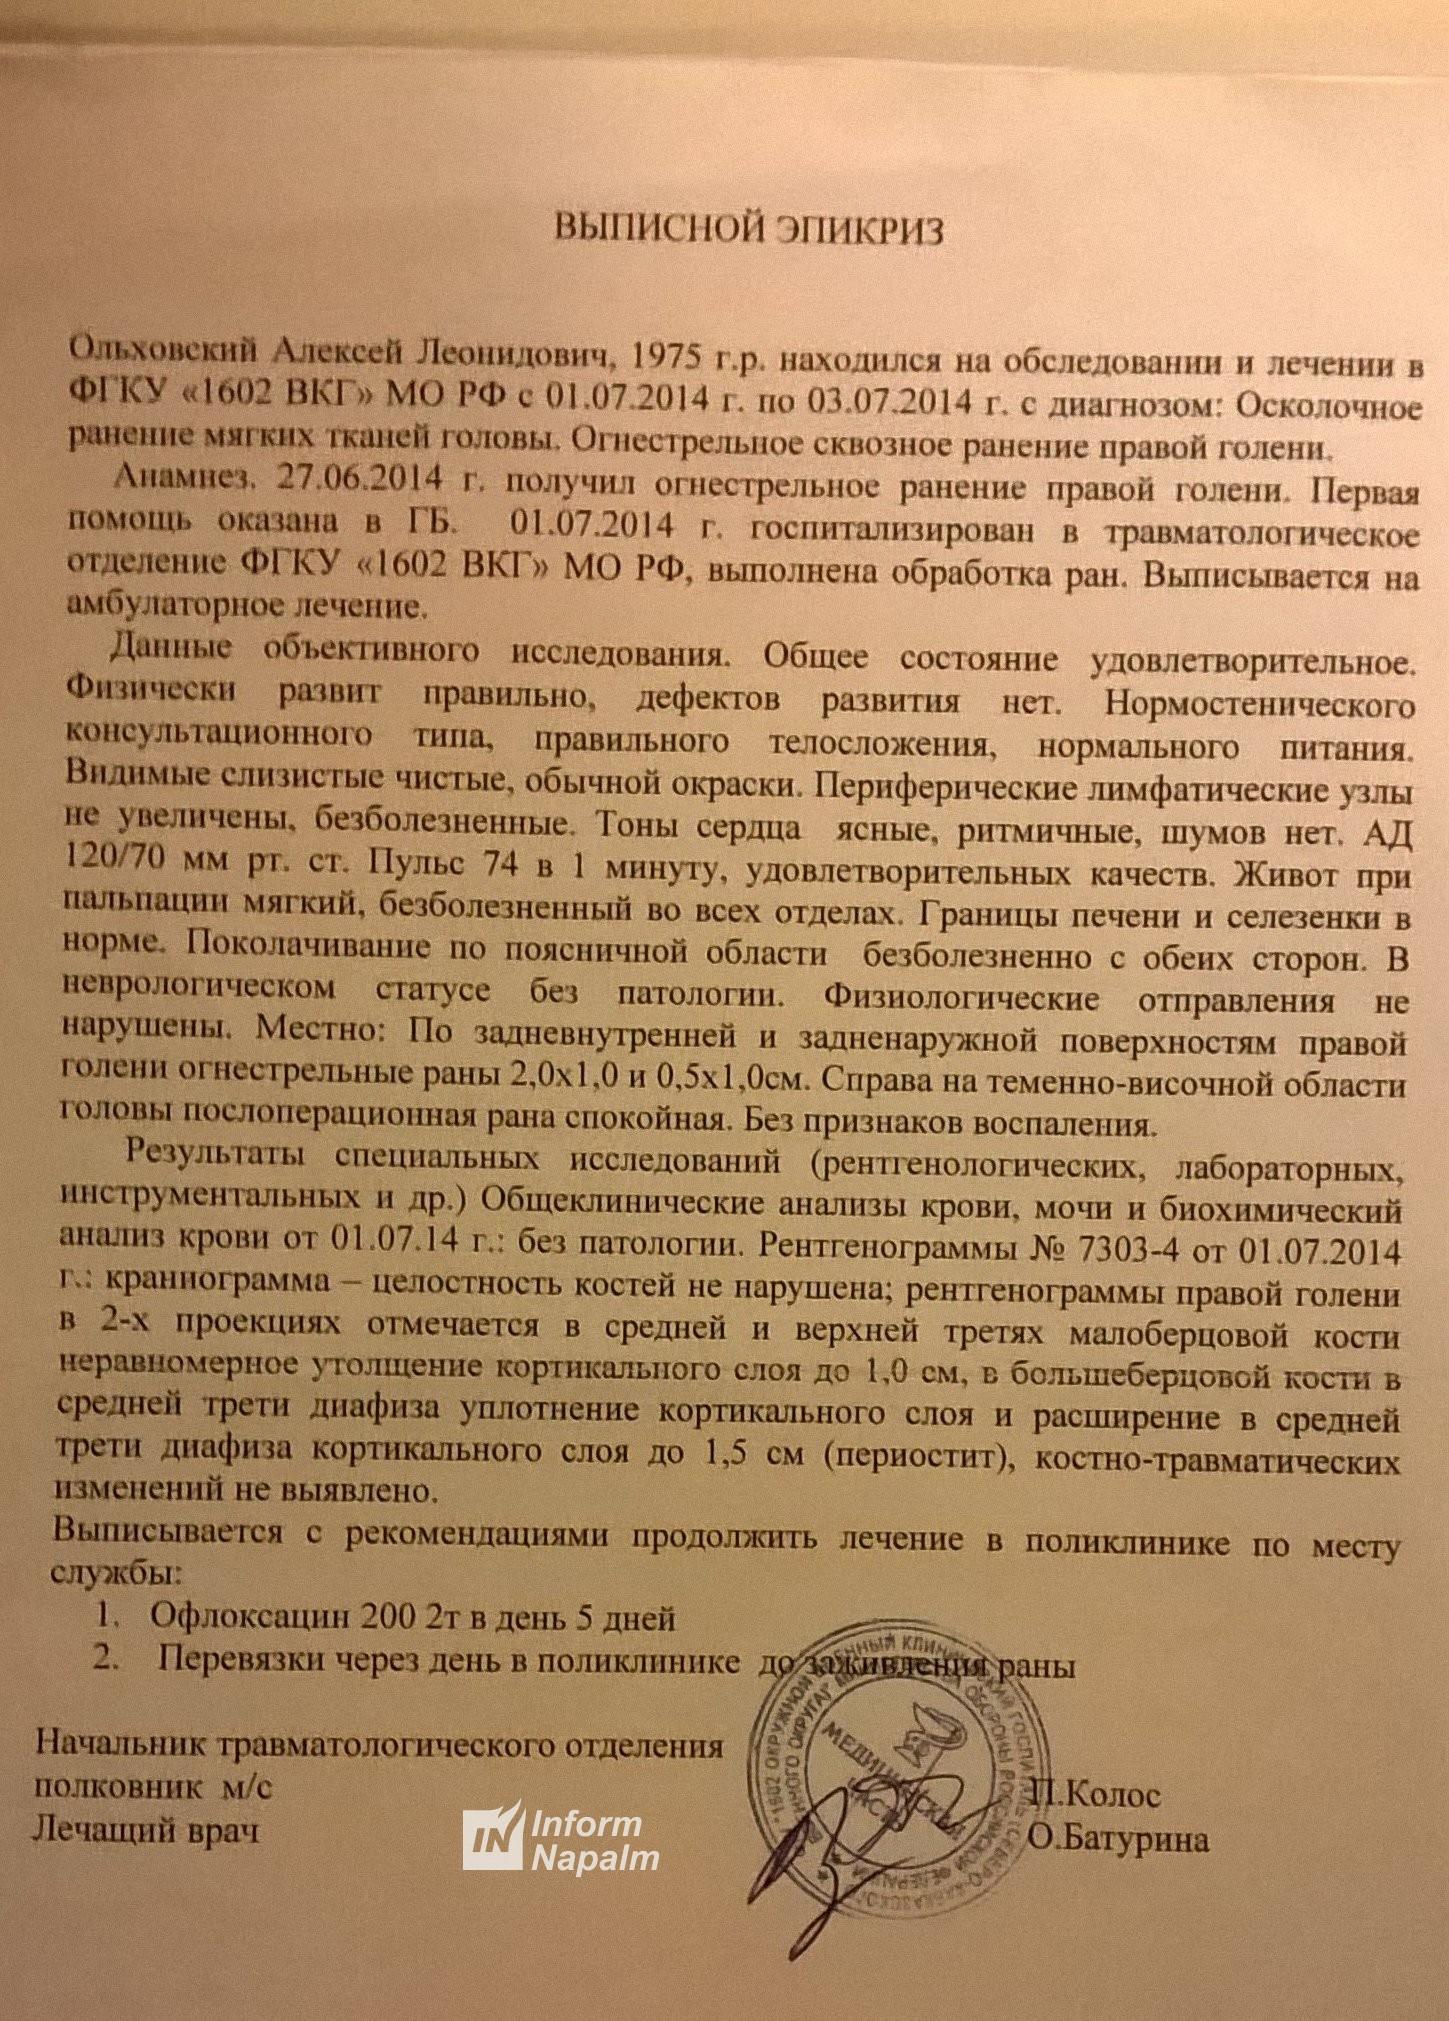 Alexei Leonidovitj Olkhovskij född 8 oktober 1975